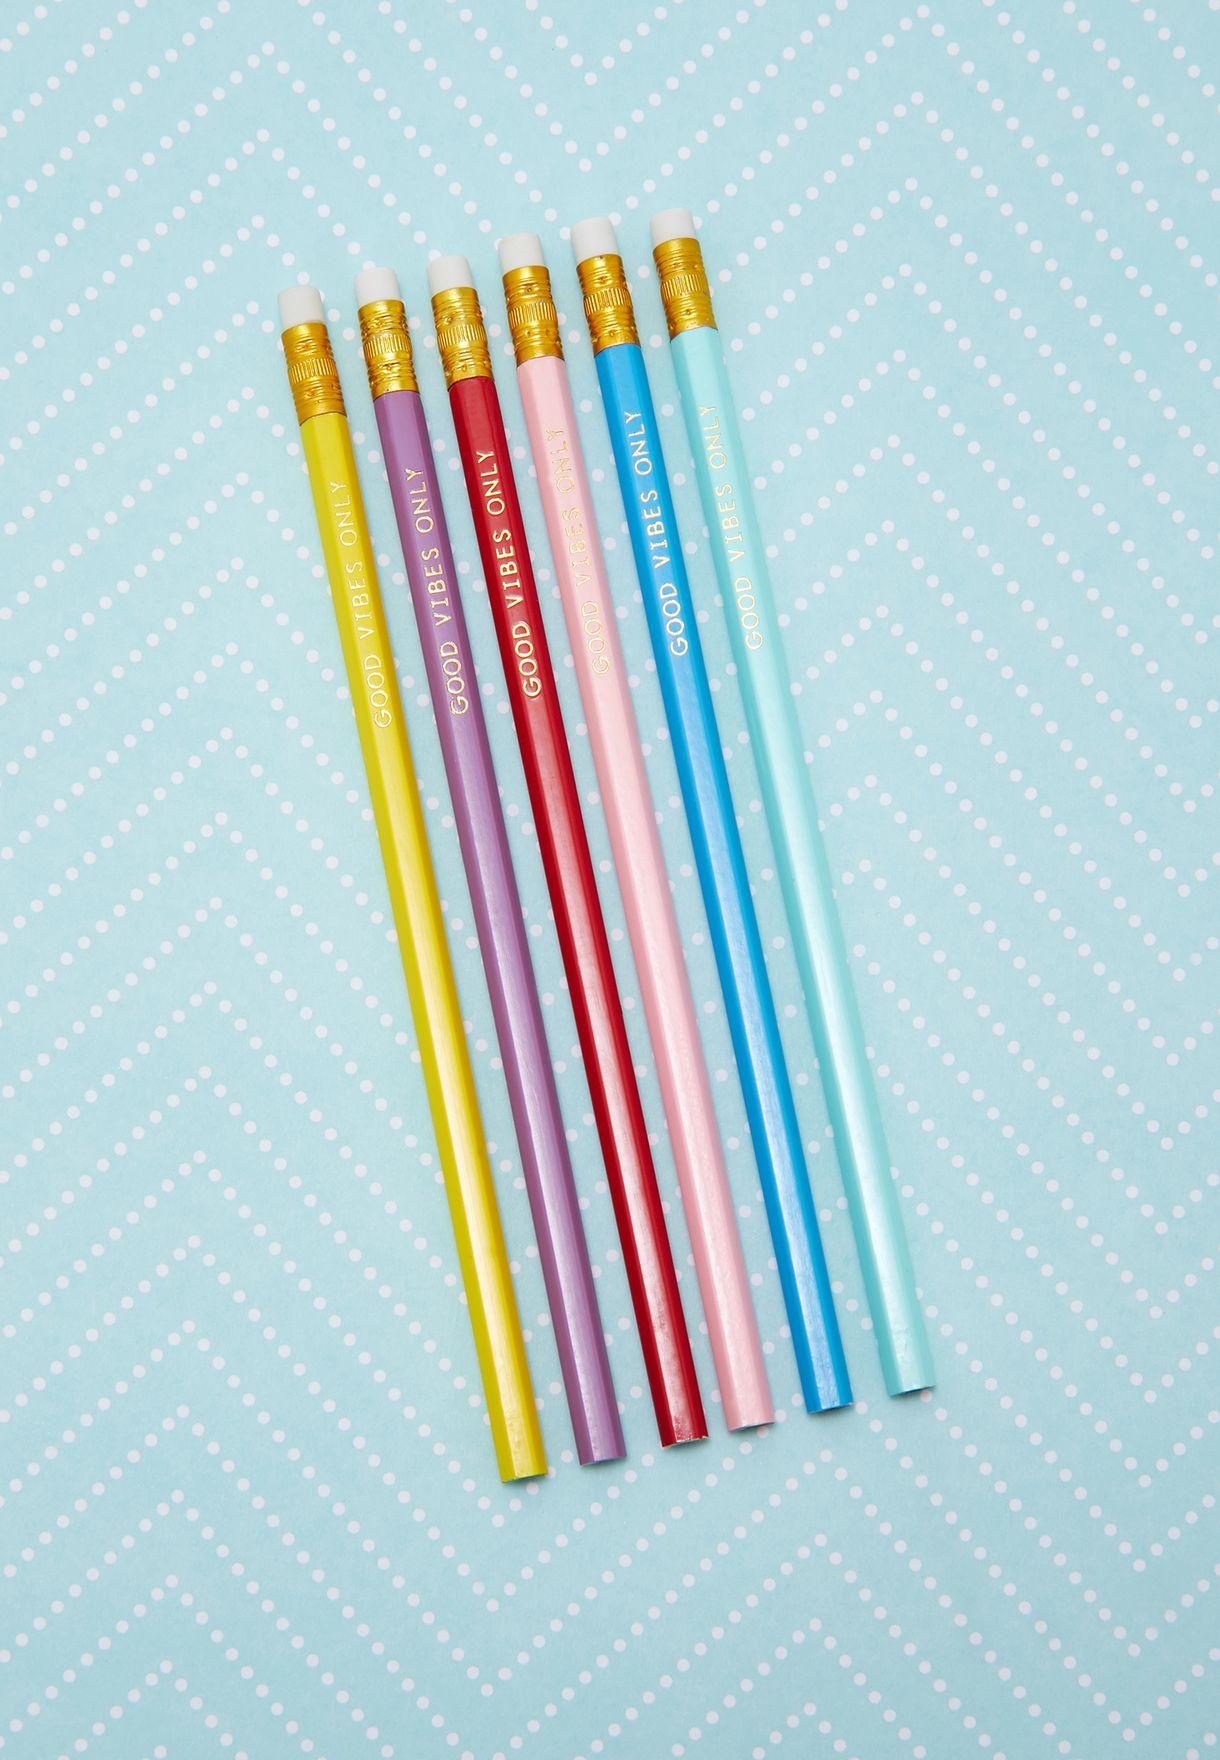 6 Pack Chasing Rainbow Pencils